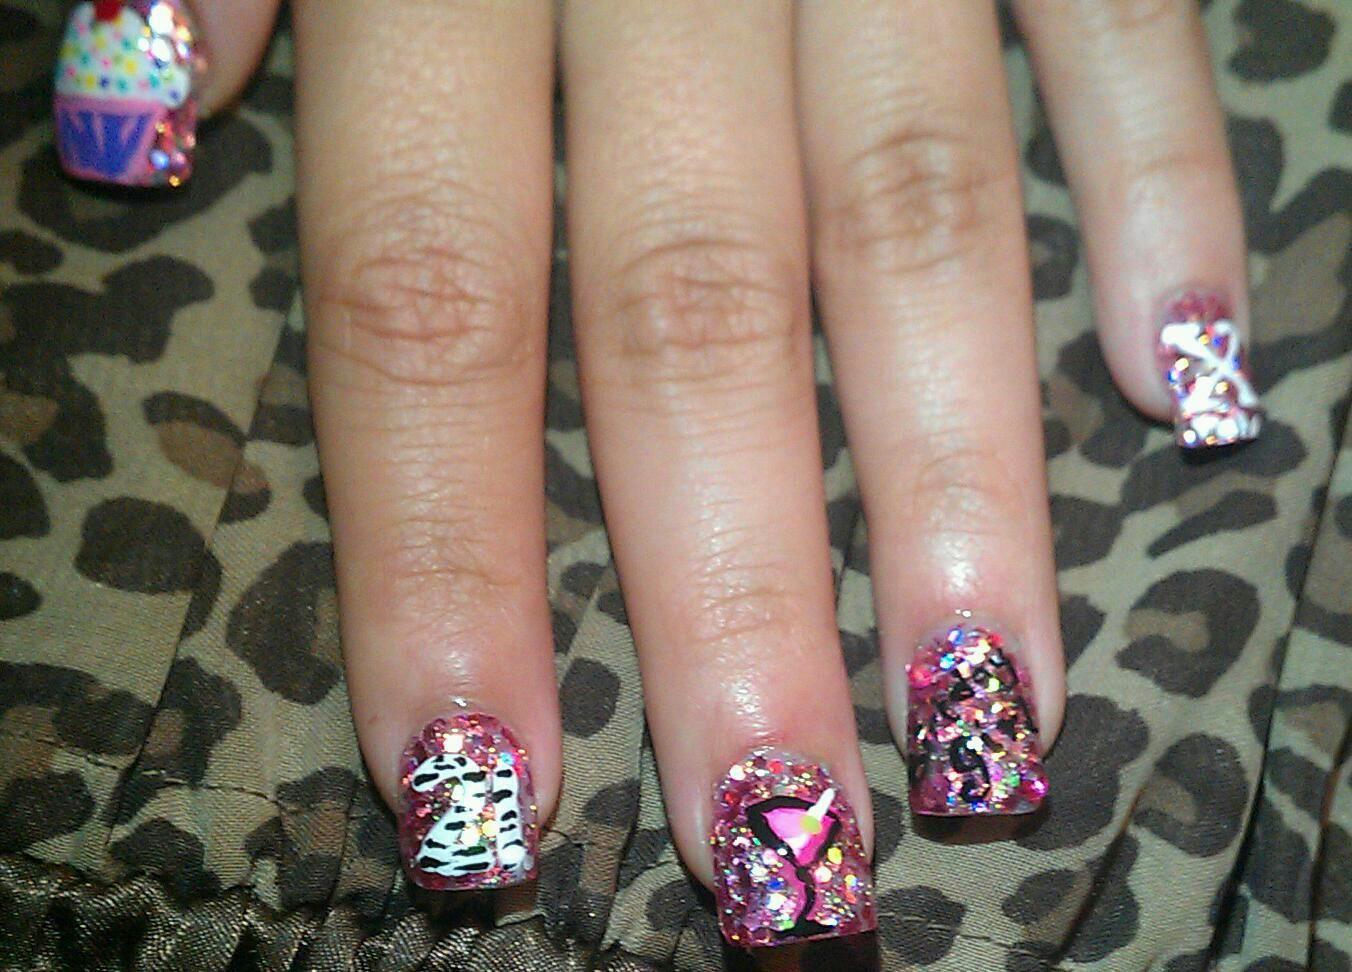 21st birthday nails. little